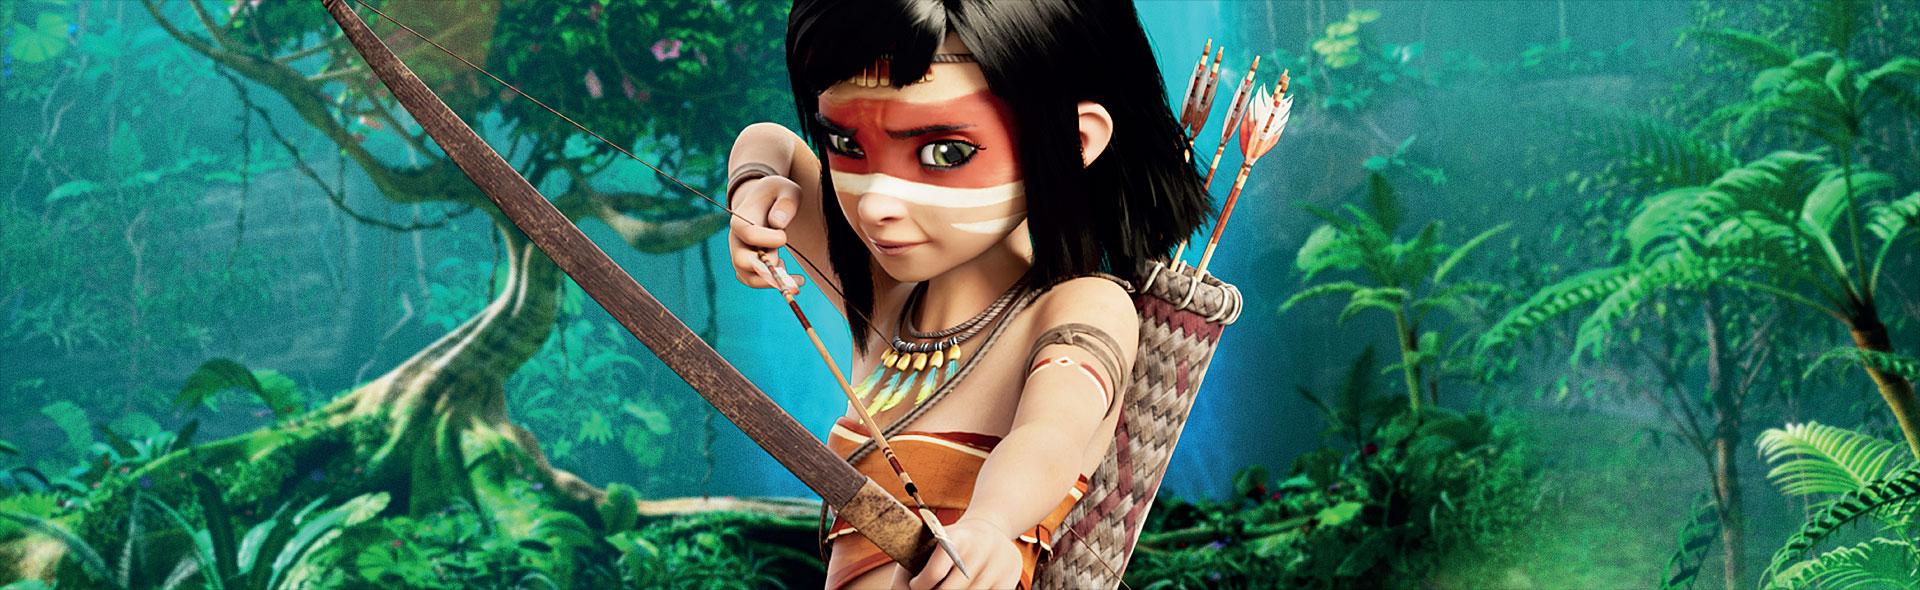 Ainbo - Amazonas vogter_slide_poster